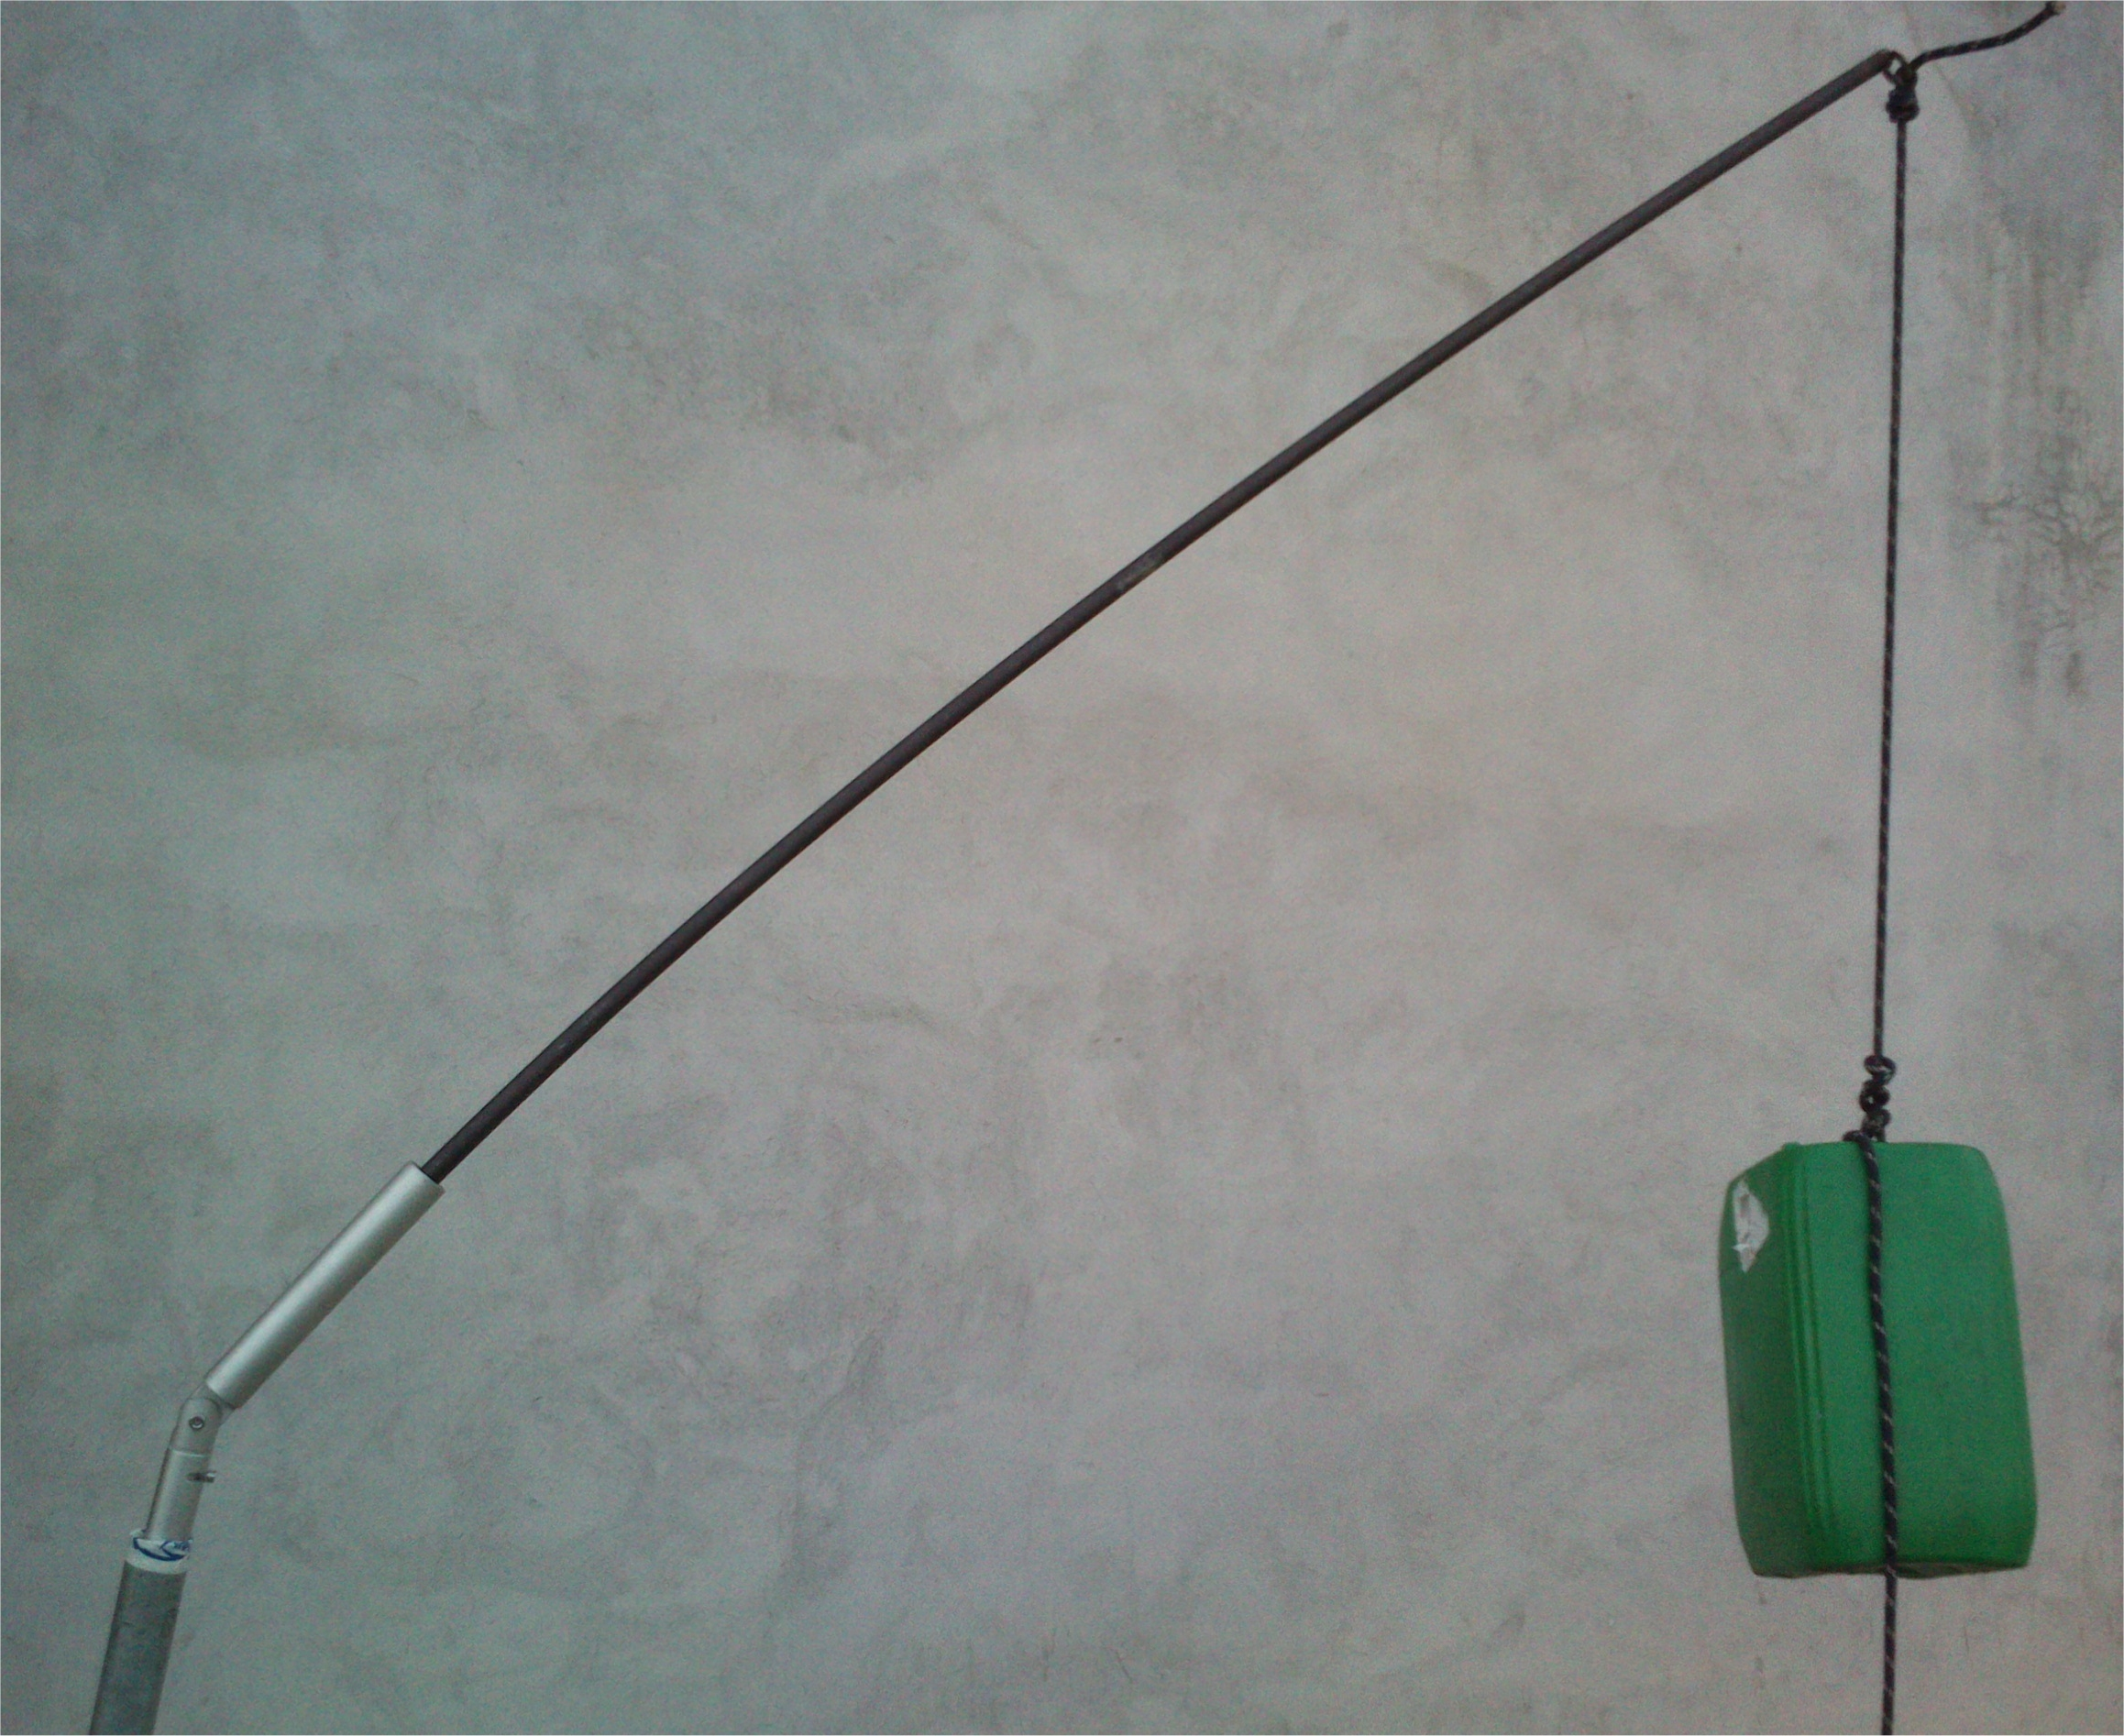 TEST con 22 KG di appesi su barra a simulare canna lunga 2 metri